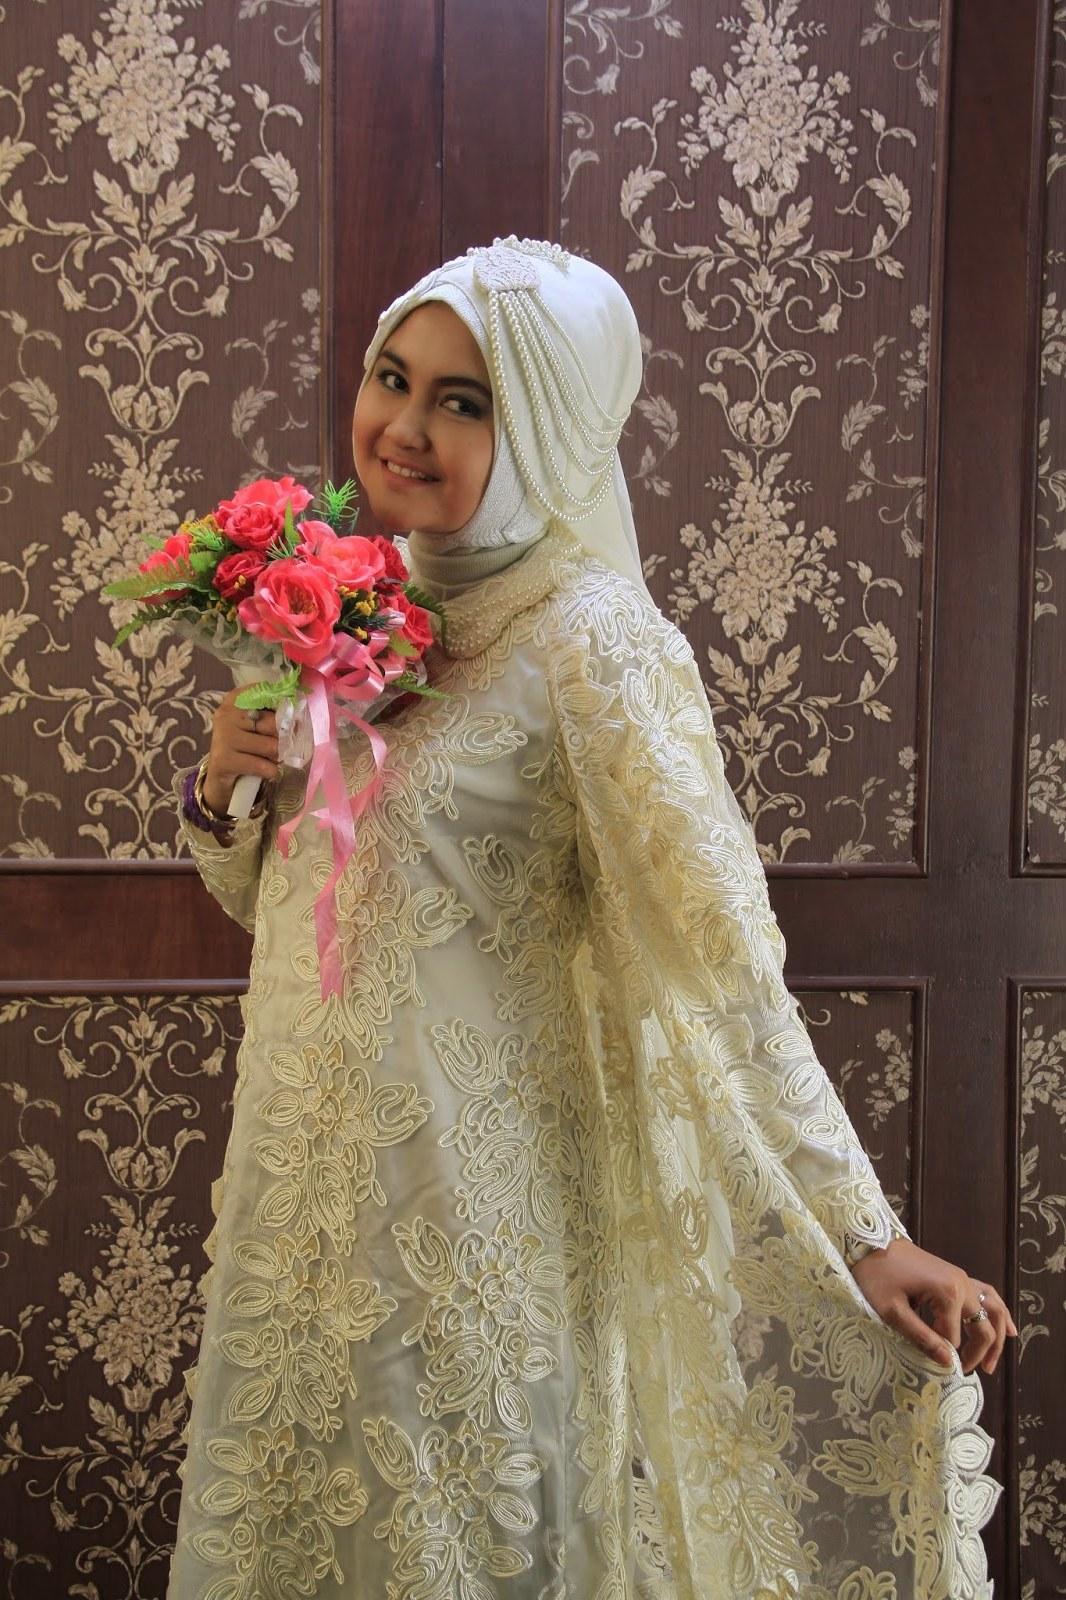 Design Foto Gaun Pengantin Muslimah Irdz Padme Wedding Dress Confessions Of A Seamstress the